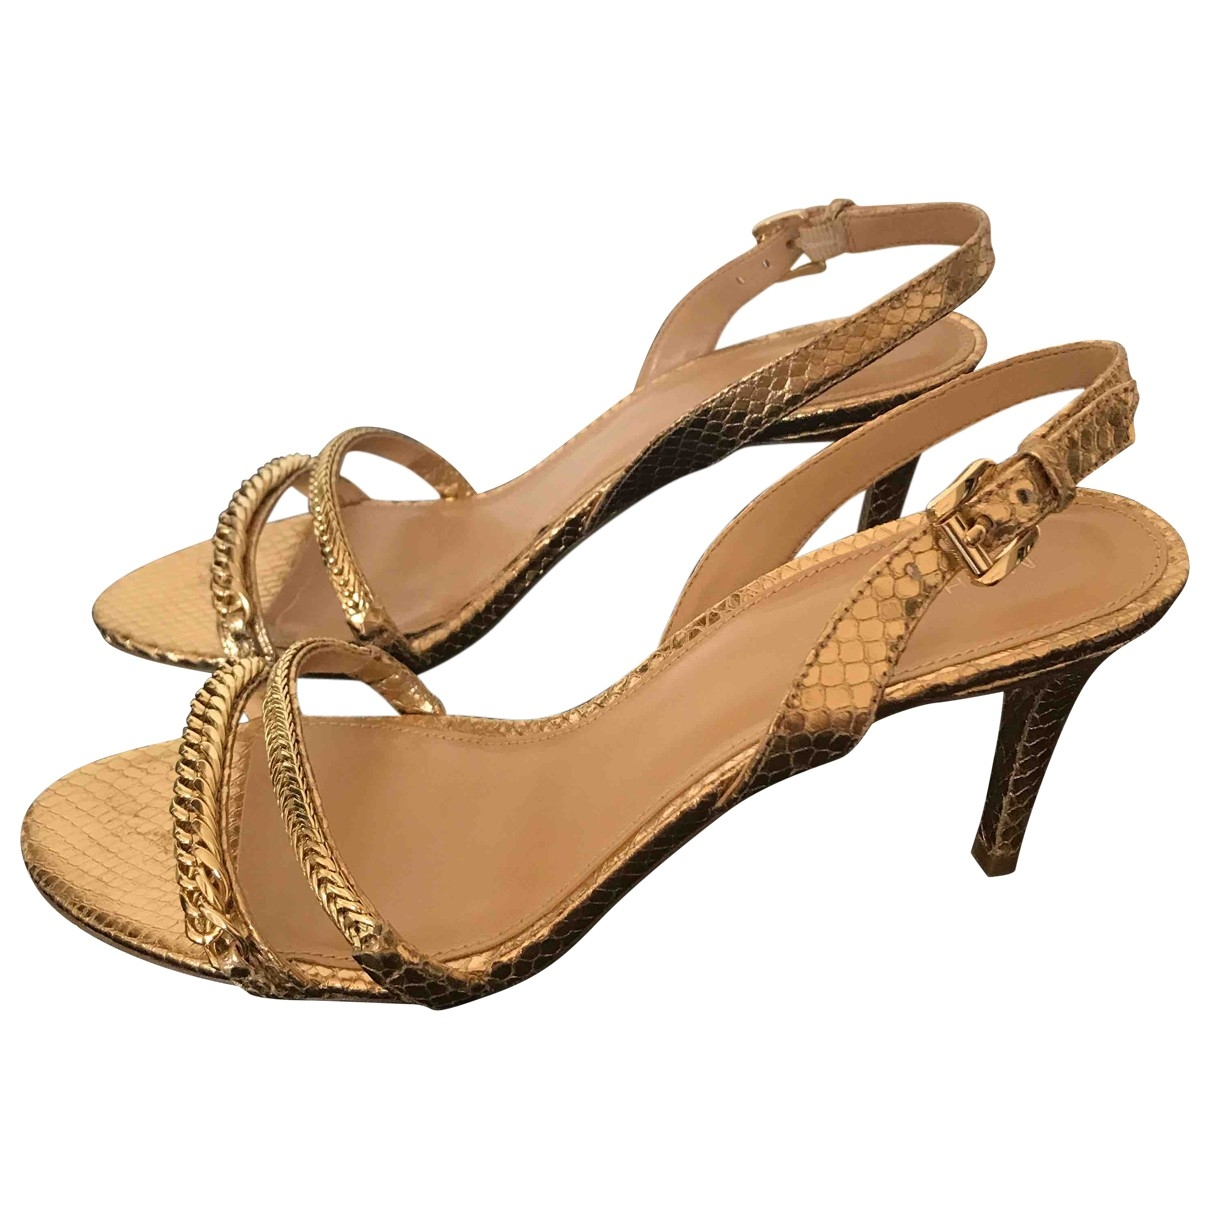 Michael Kors \N Gold Leather Heels for Women 10 US